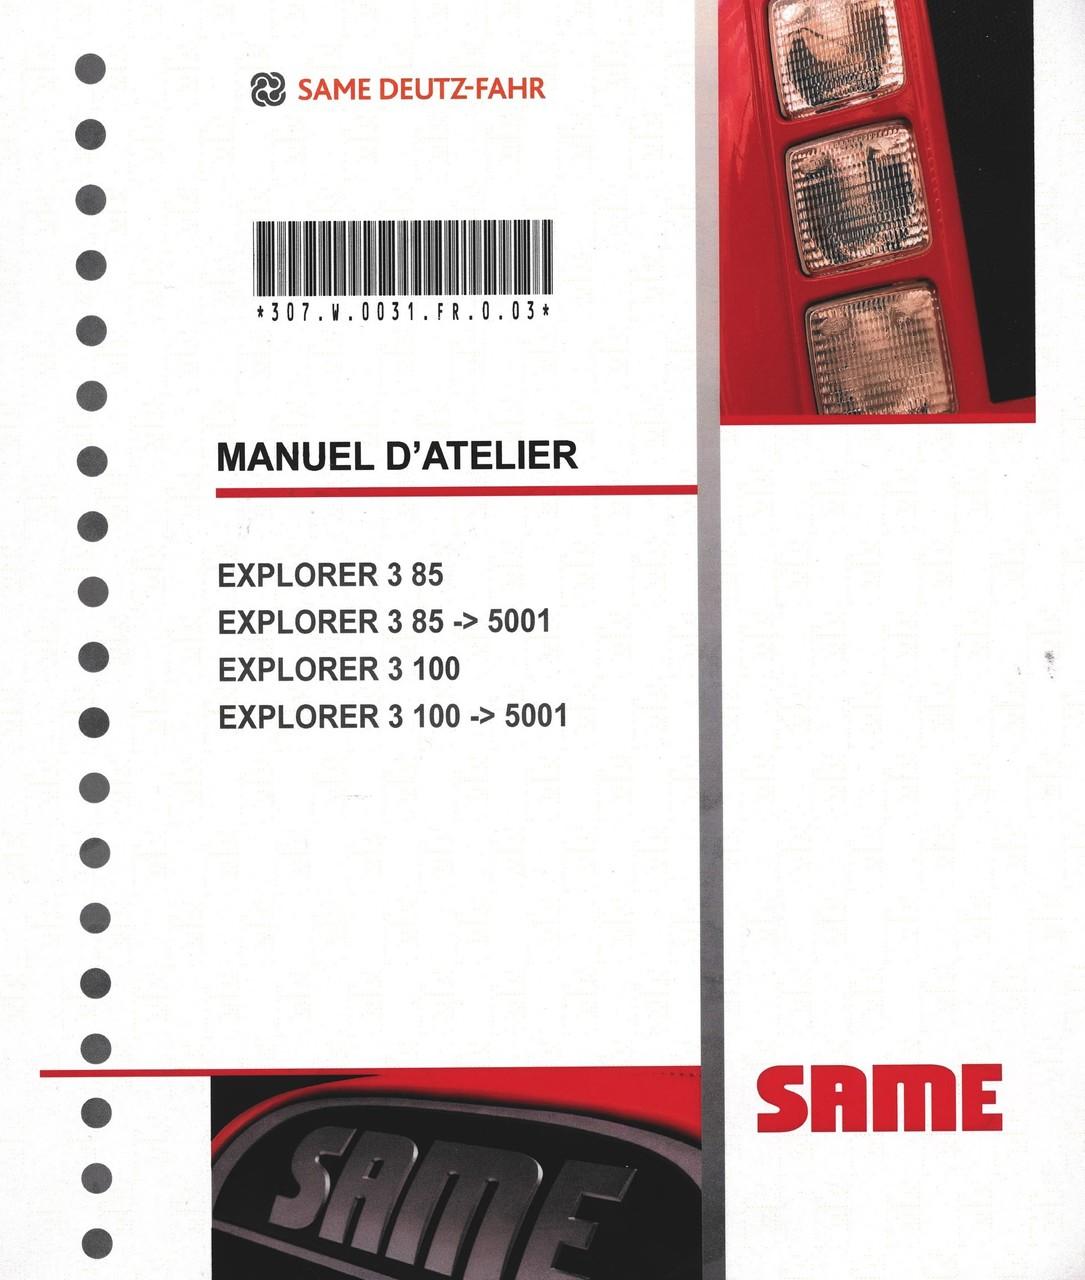 EXPLORER 3 85 - EXPLORER 3 85 ->5001 - EXPLORER 3 100 - EXPLORER 3 100 ->5001 - Manuel d'atelier